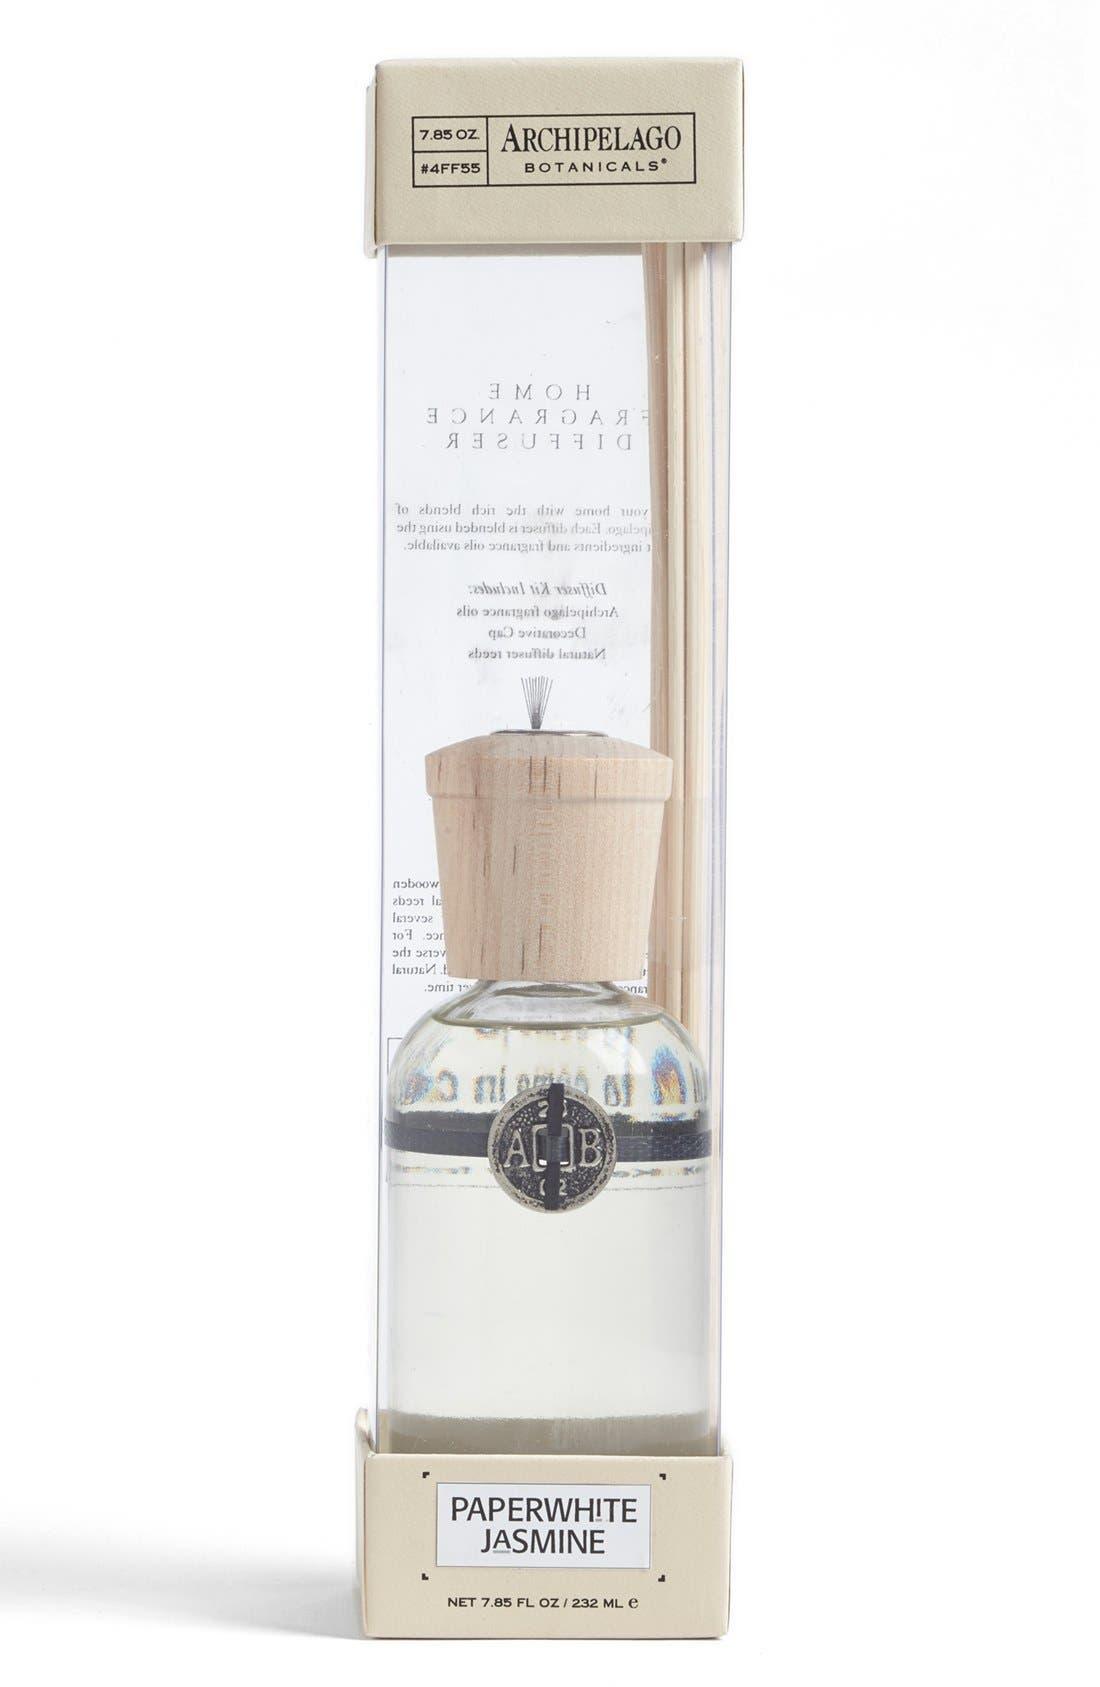 Alternate Image 1 Selected - Archipelago Botanicals 'Paperwhite Jasmine' Fragrance Diffuser (Special Purchase)